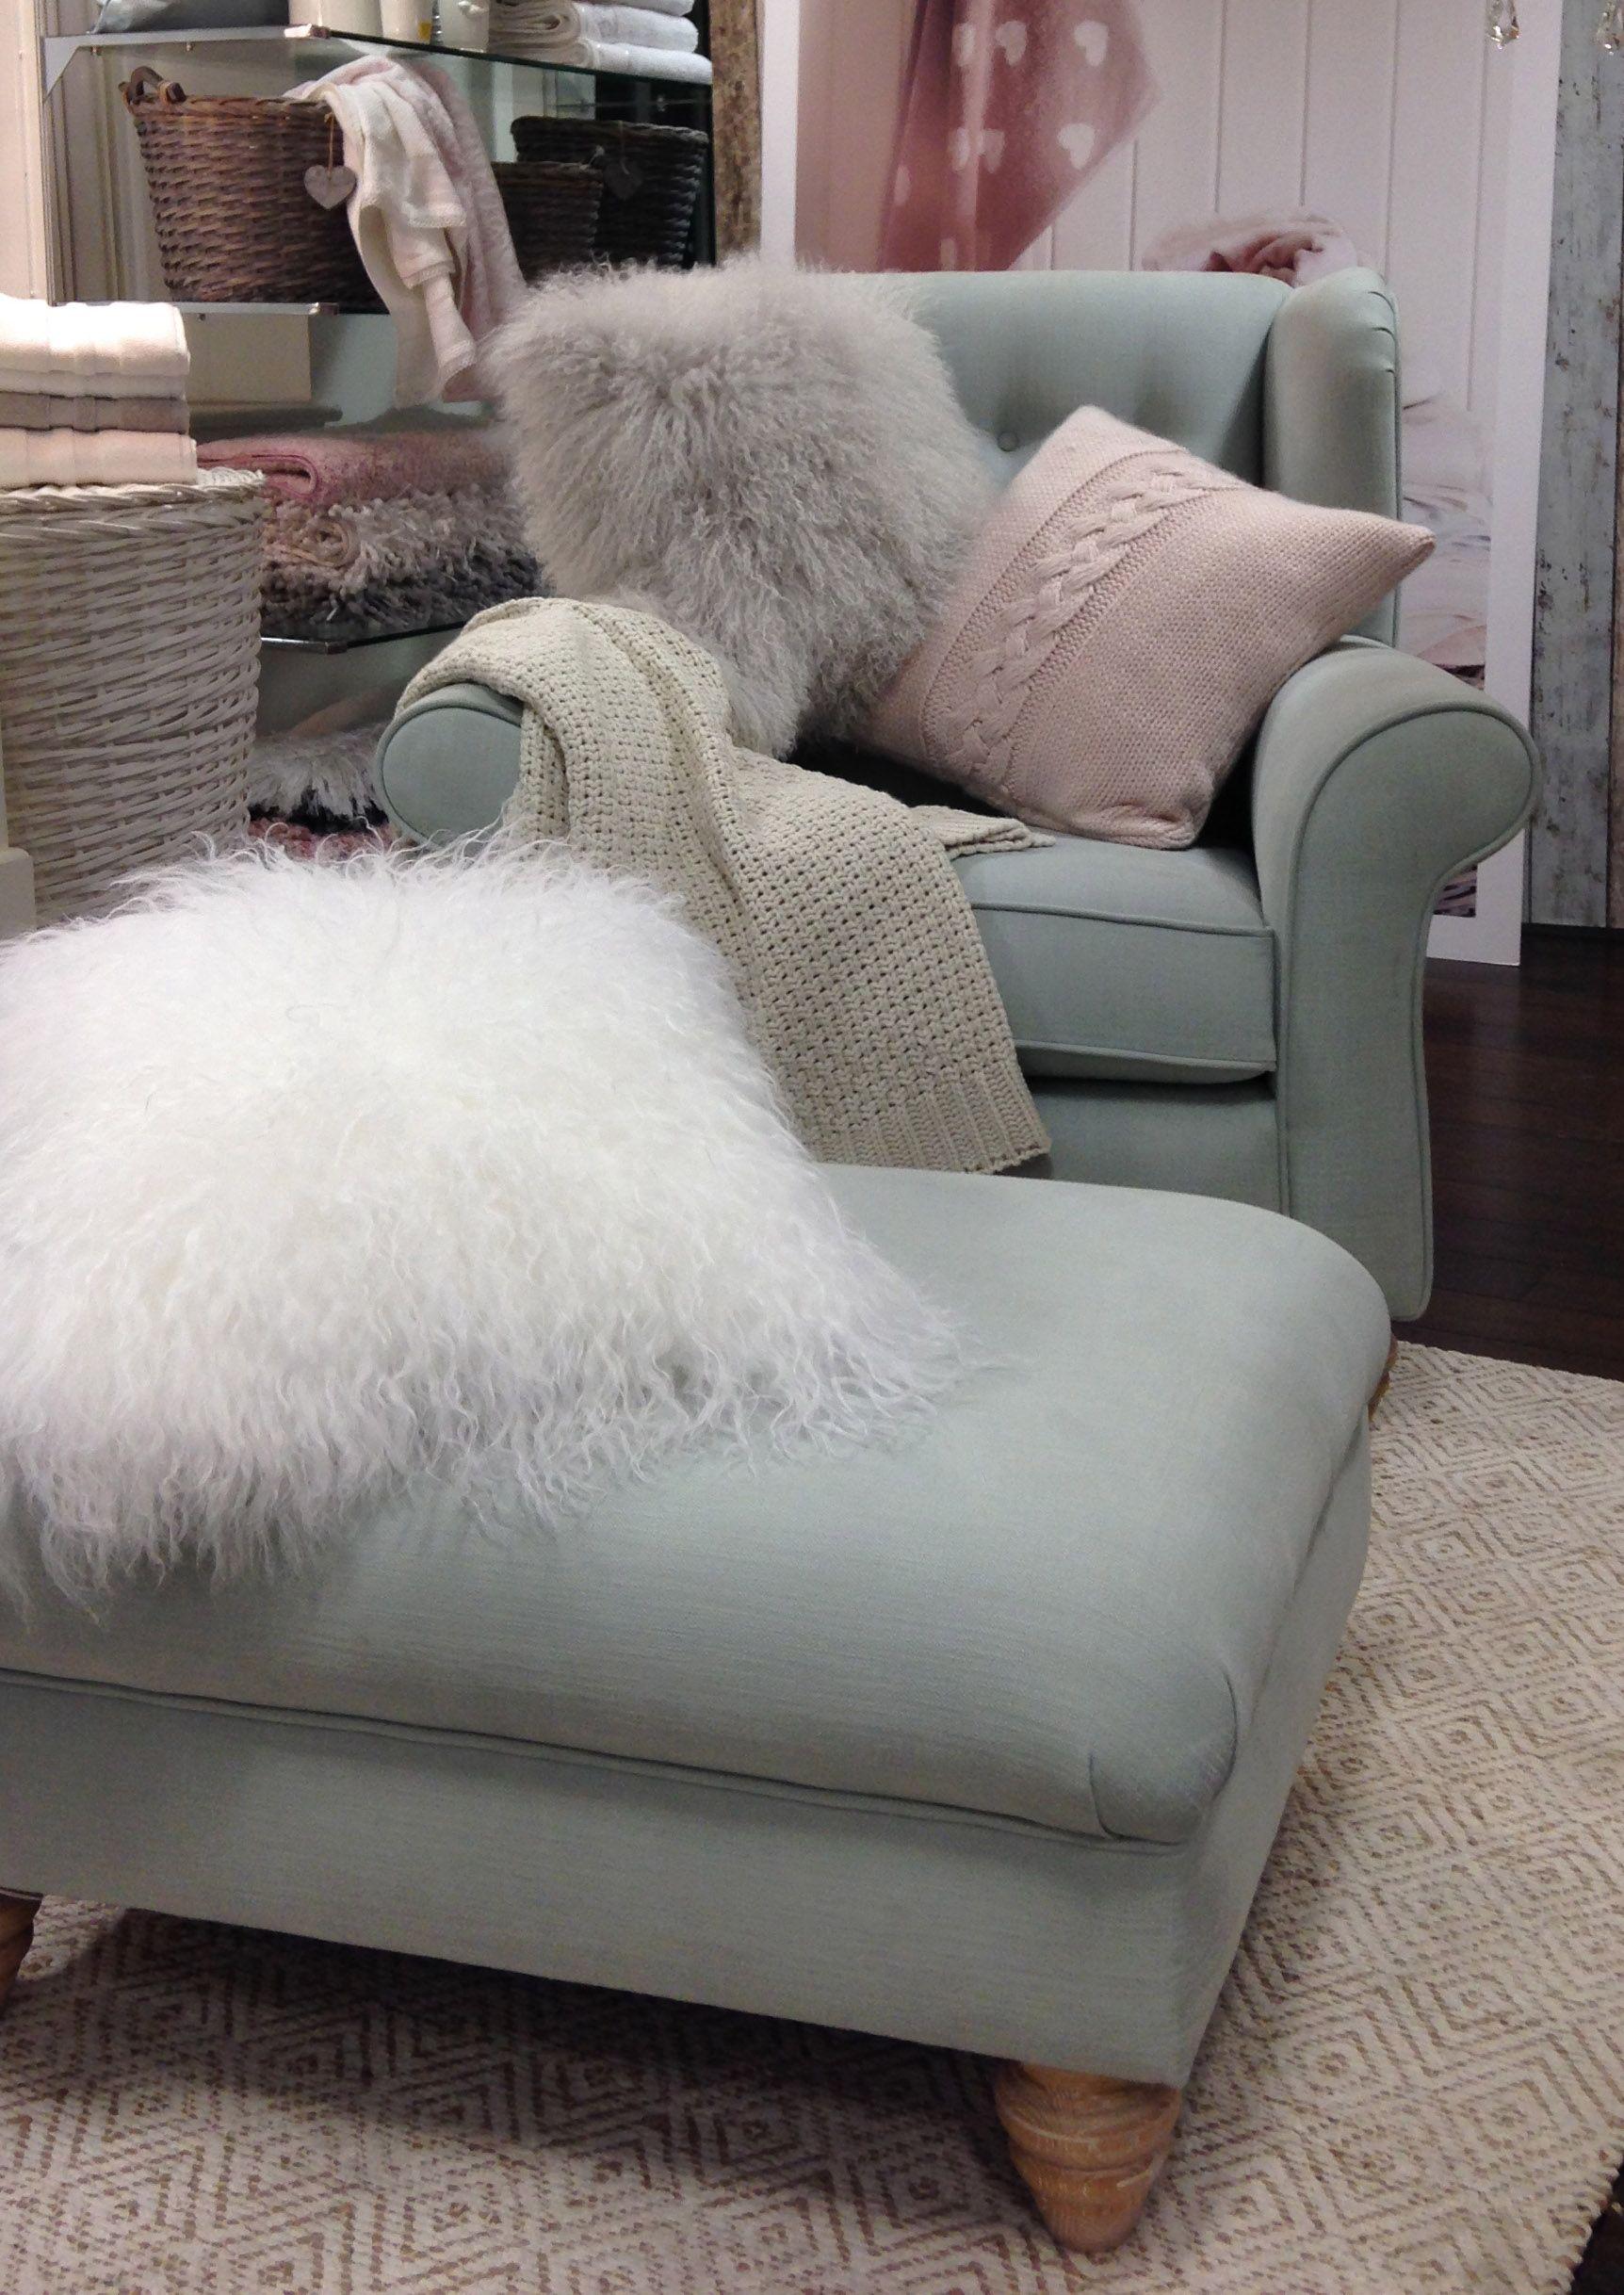 BHS HOME Mint chair knit cushions Throw pastel colour collection & BHS HOME SS14 Primrose Hill Arm Chair cushions Pastel   VISUAL ...